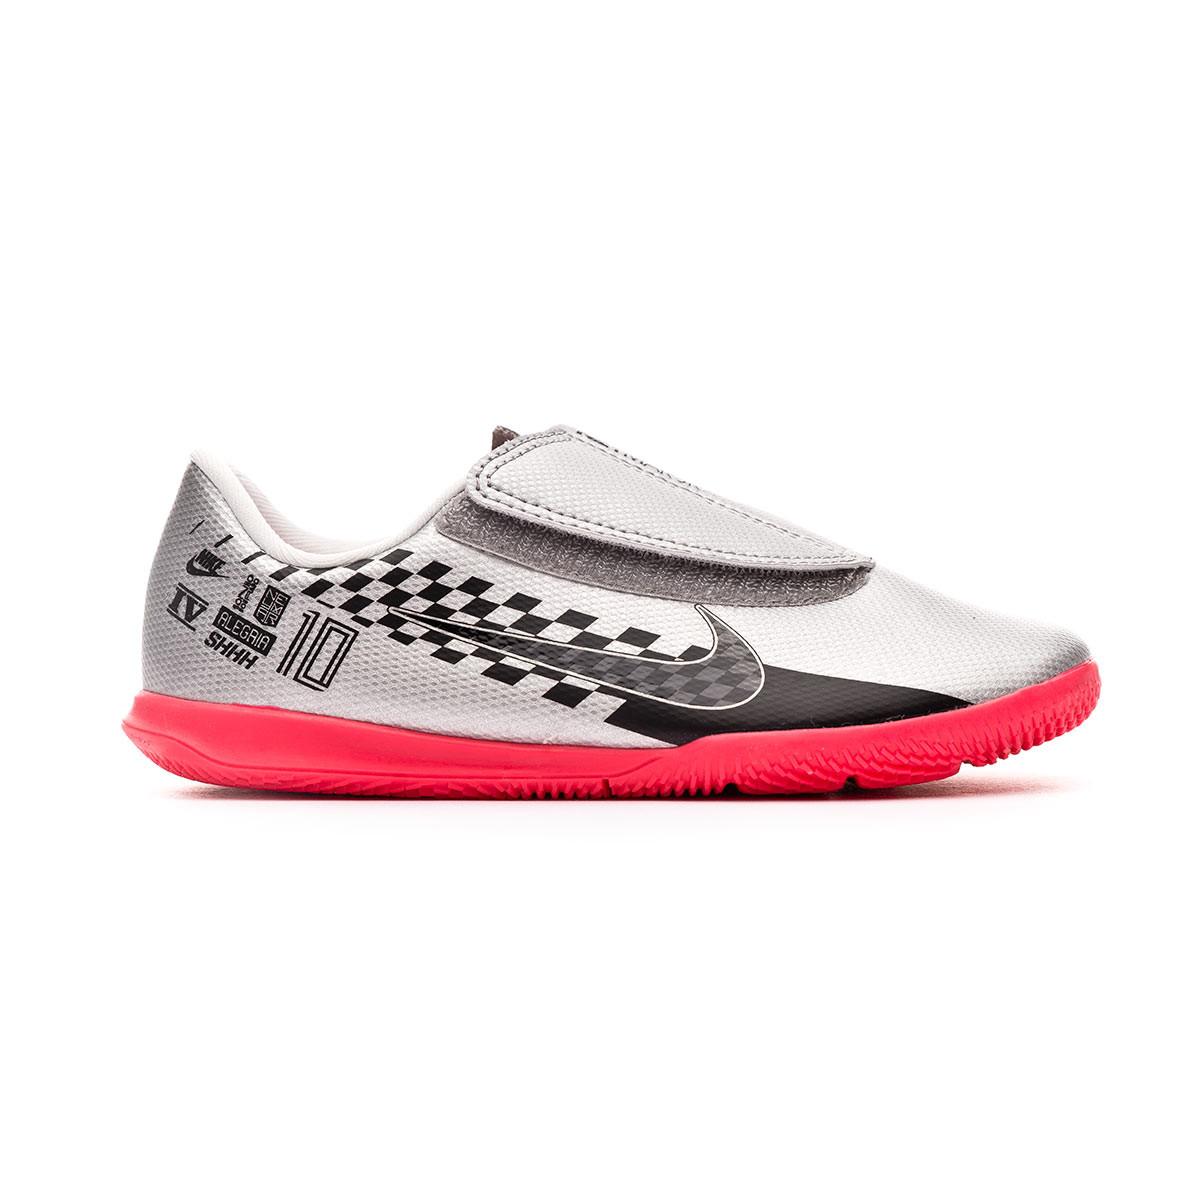 Chaussure de futsal Nike Mercurial Vapor XIII Club IC Neymar Jr Scratch Niño